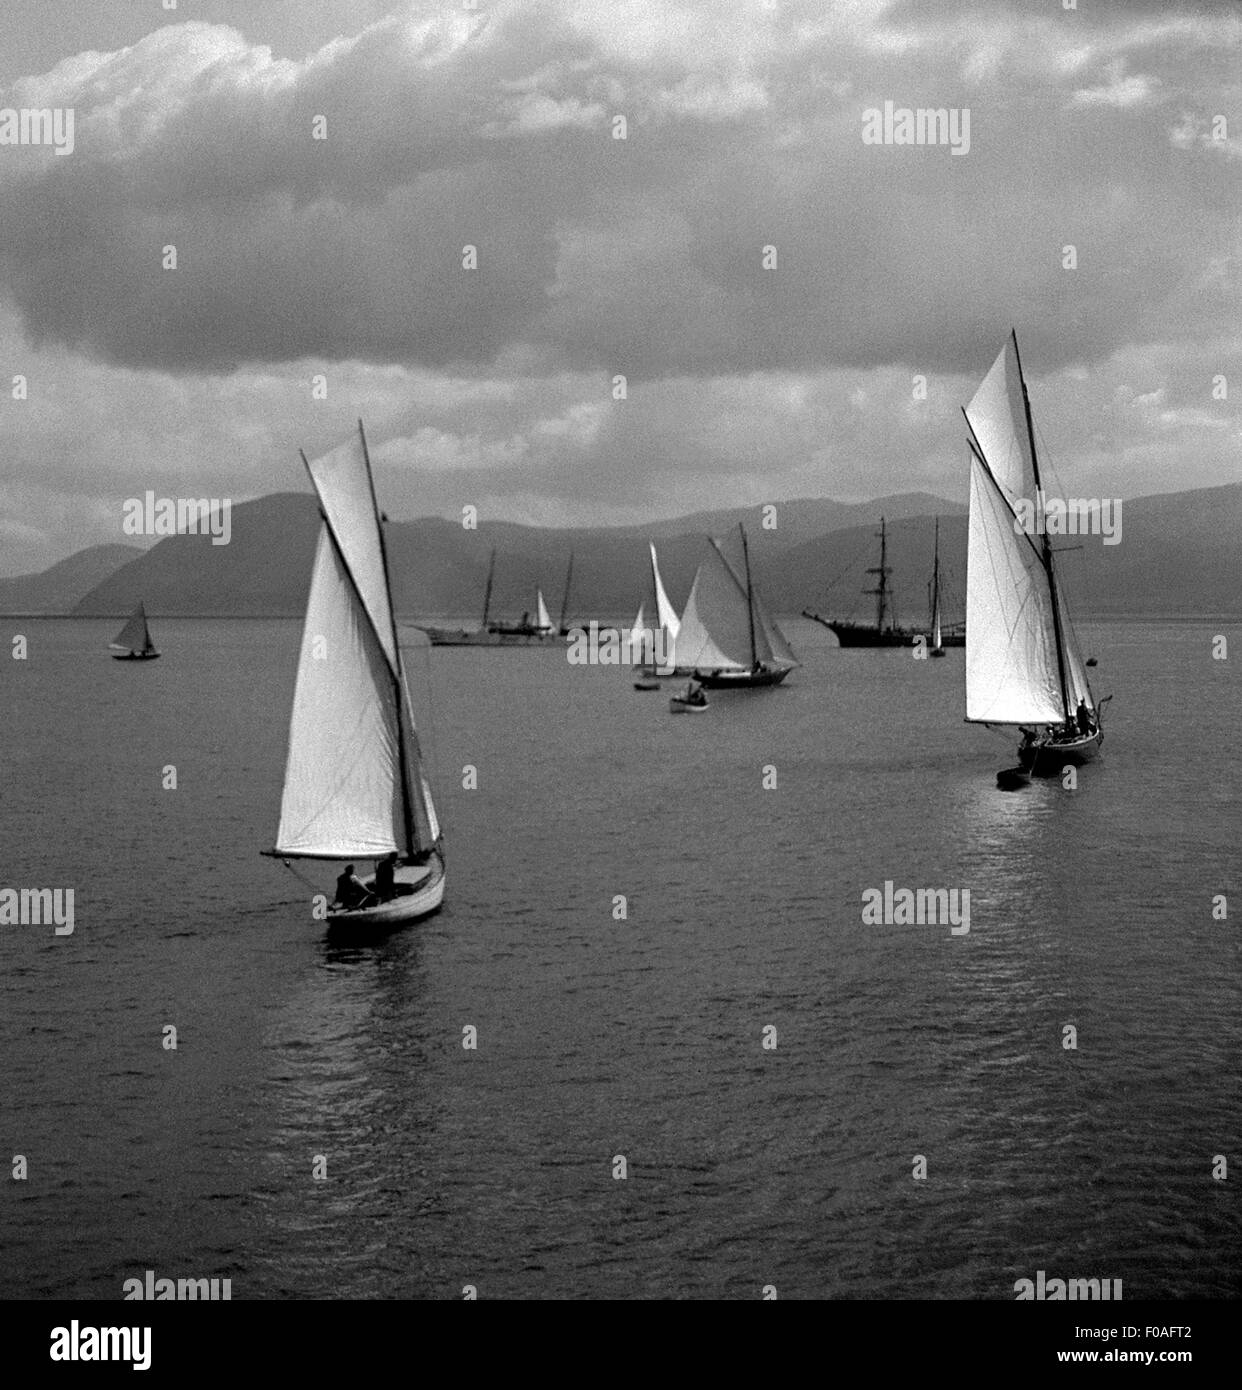 AJAXNETPHOTO - 1911-12 APPROX -. REGATTA -  EDWARDIAN YACHTING IN THE BAY OF OBAN, SCOTLAND. PHOTO:AJAX VINTAGE - Stock Image